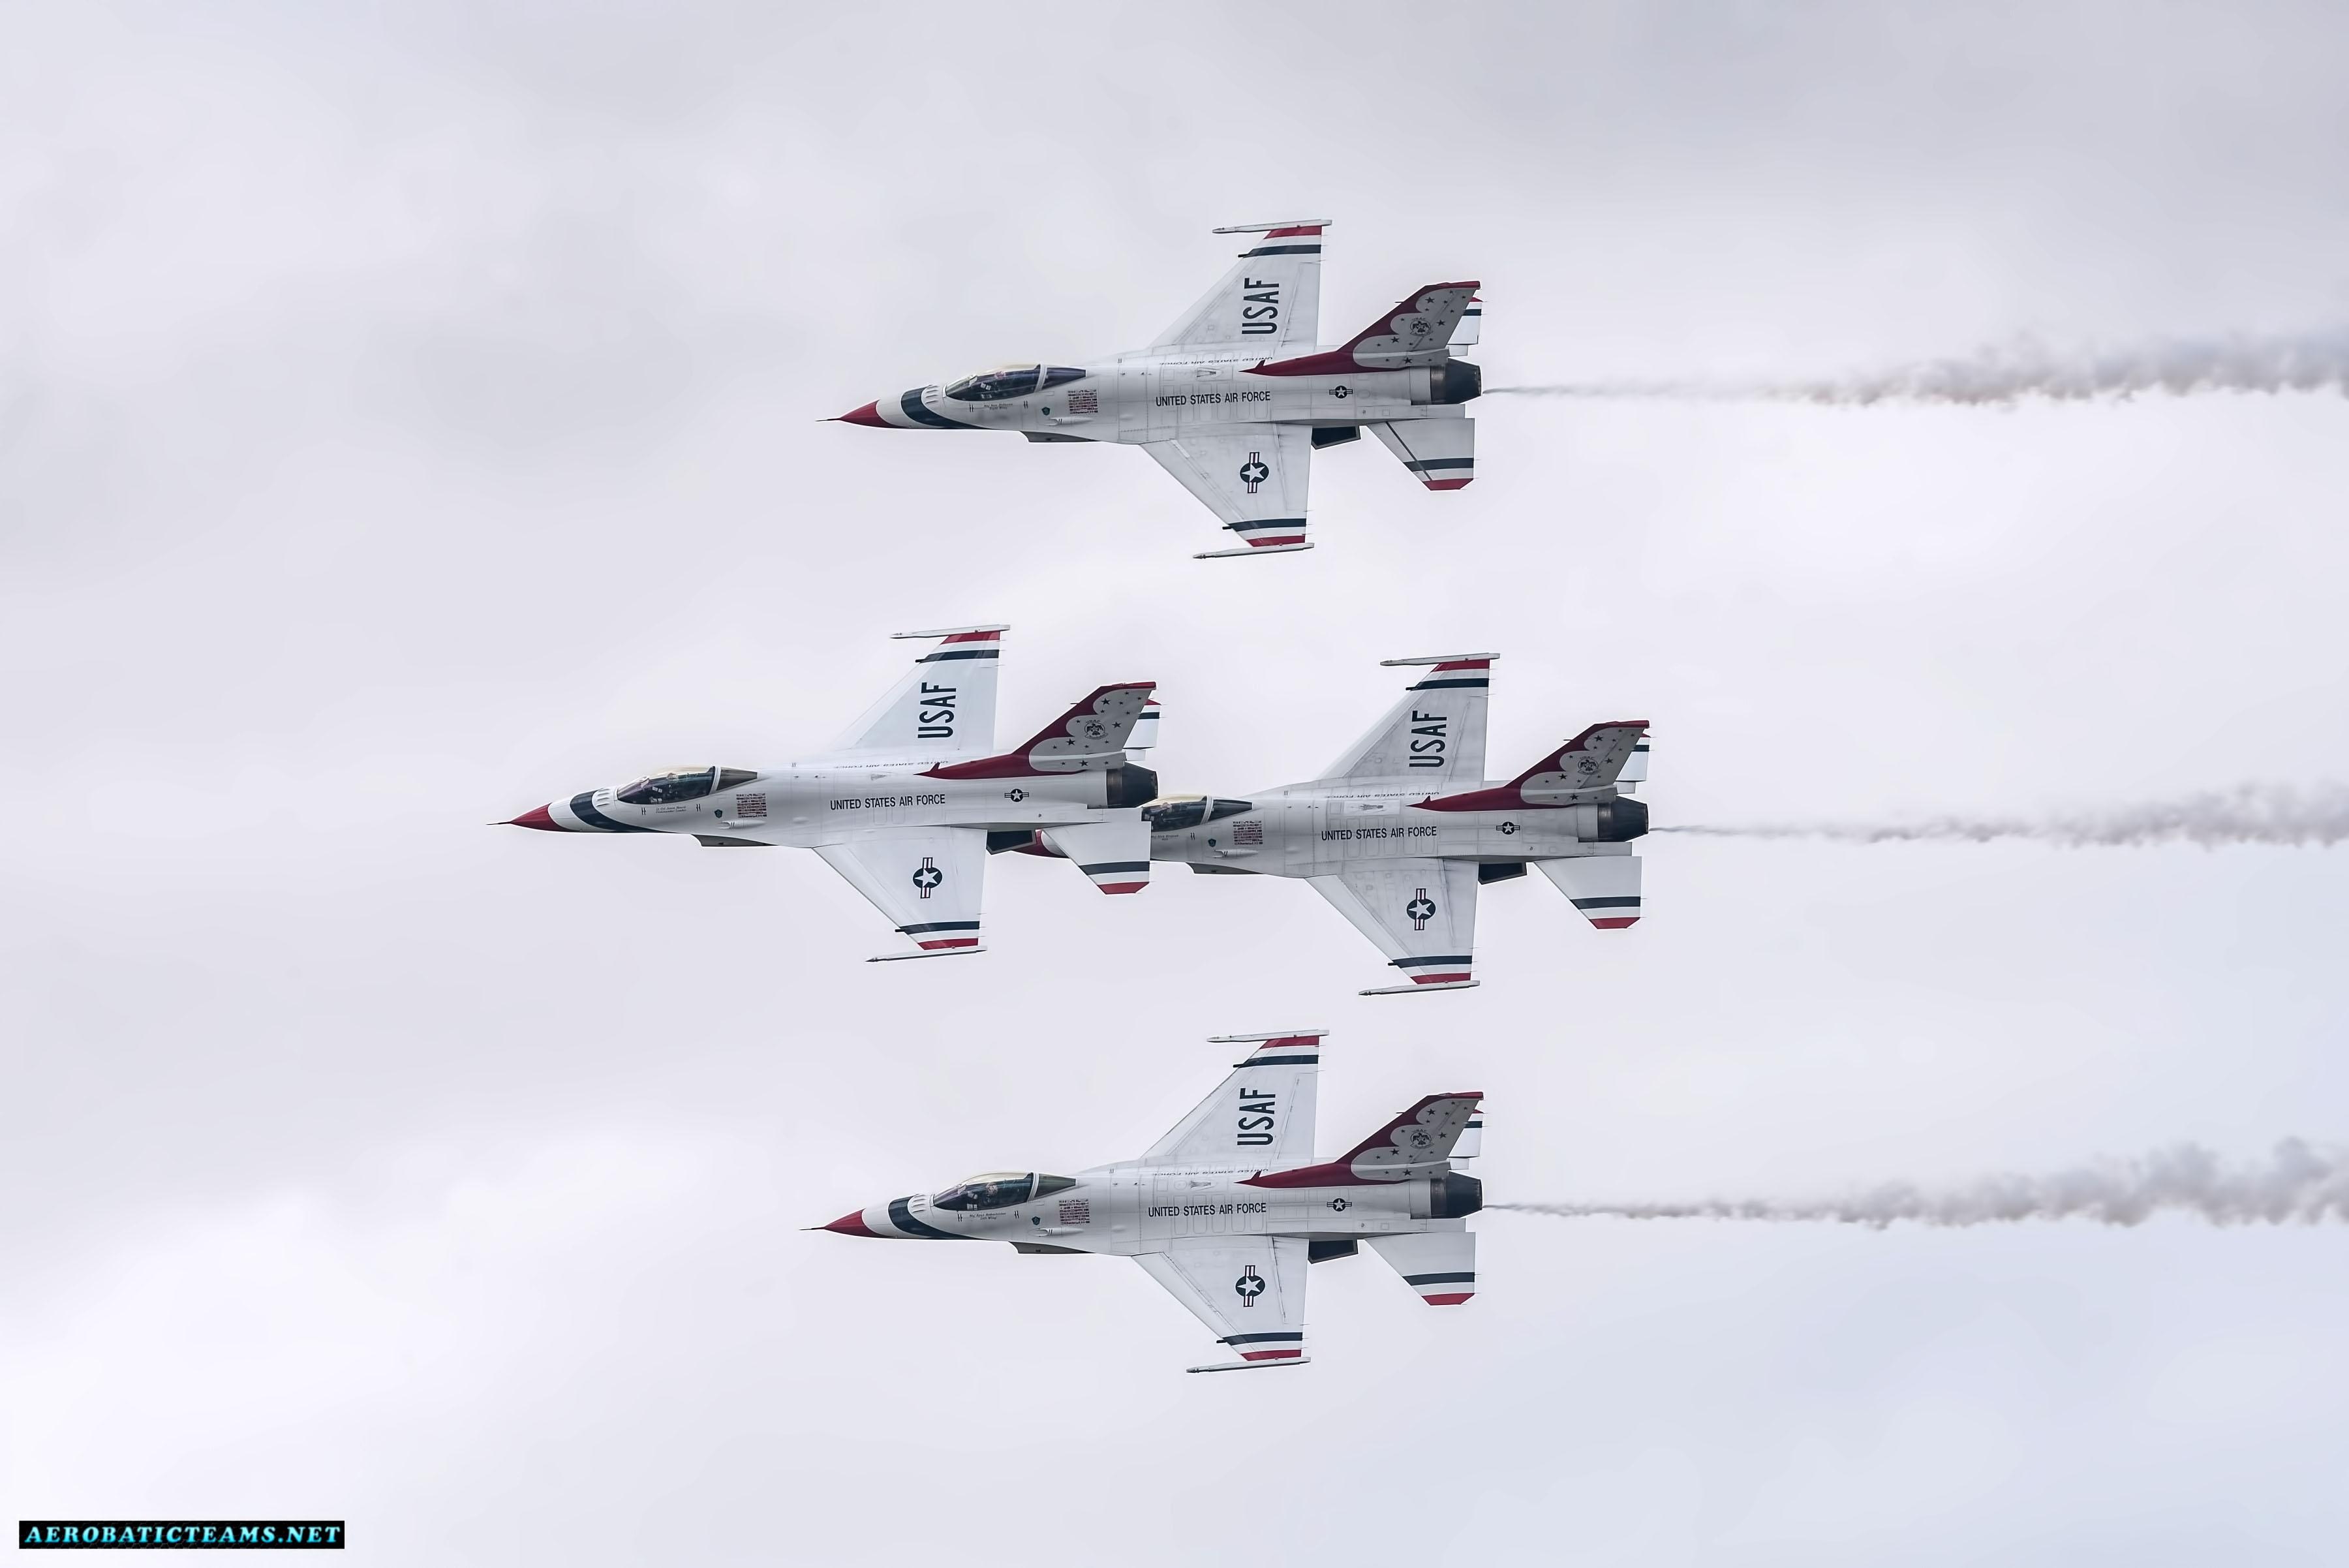 USAF Thunderbirds resume airshow displays